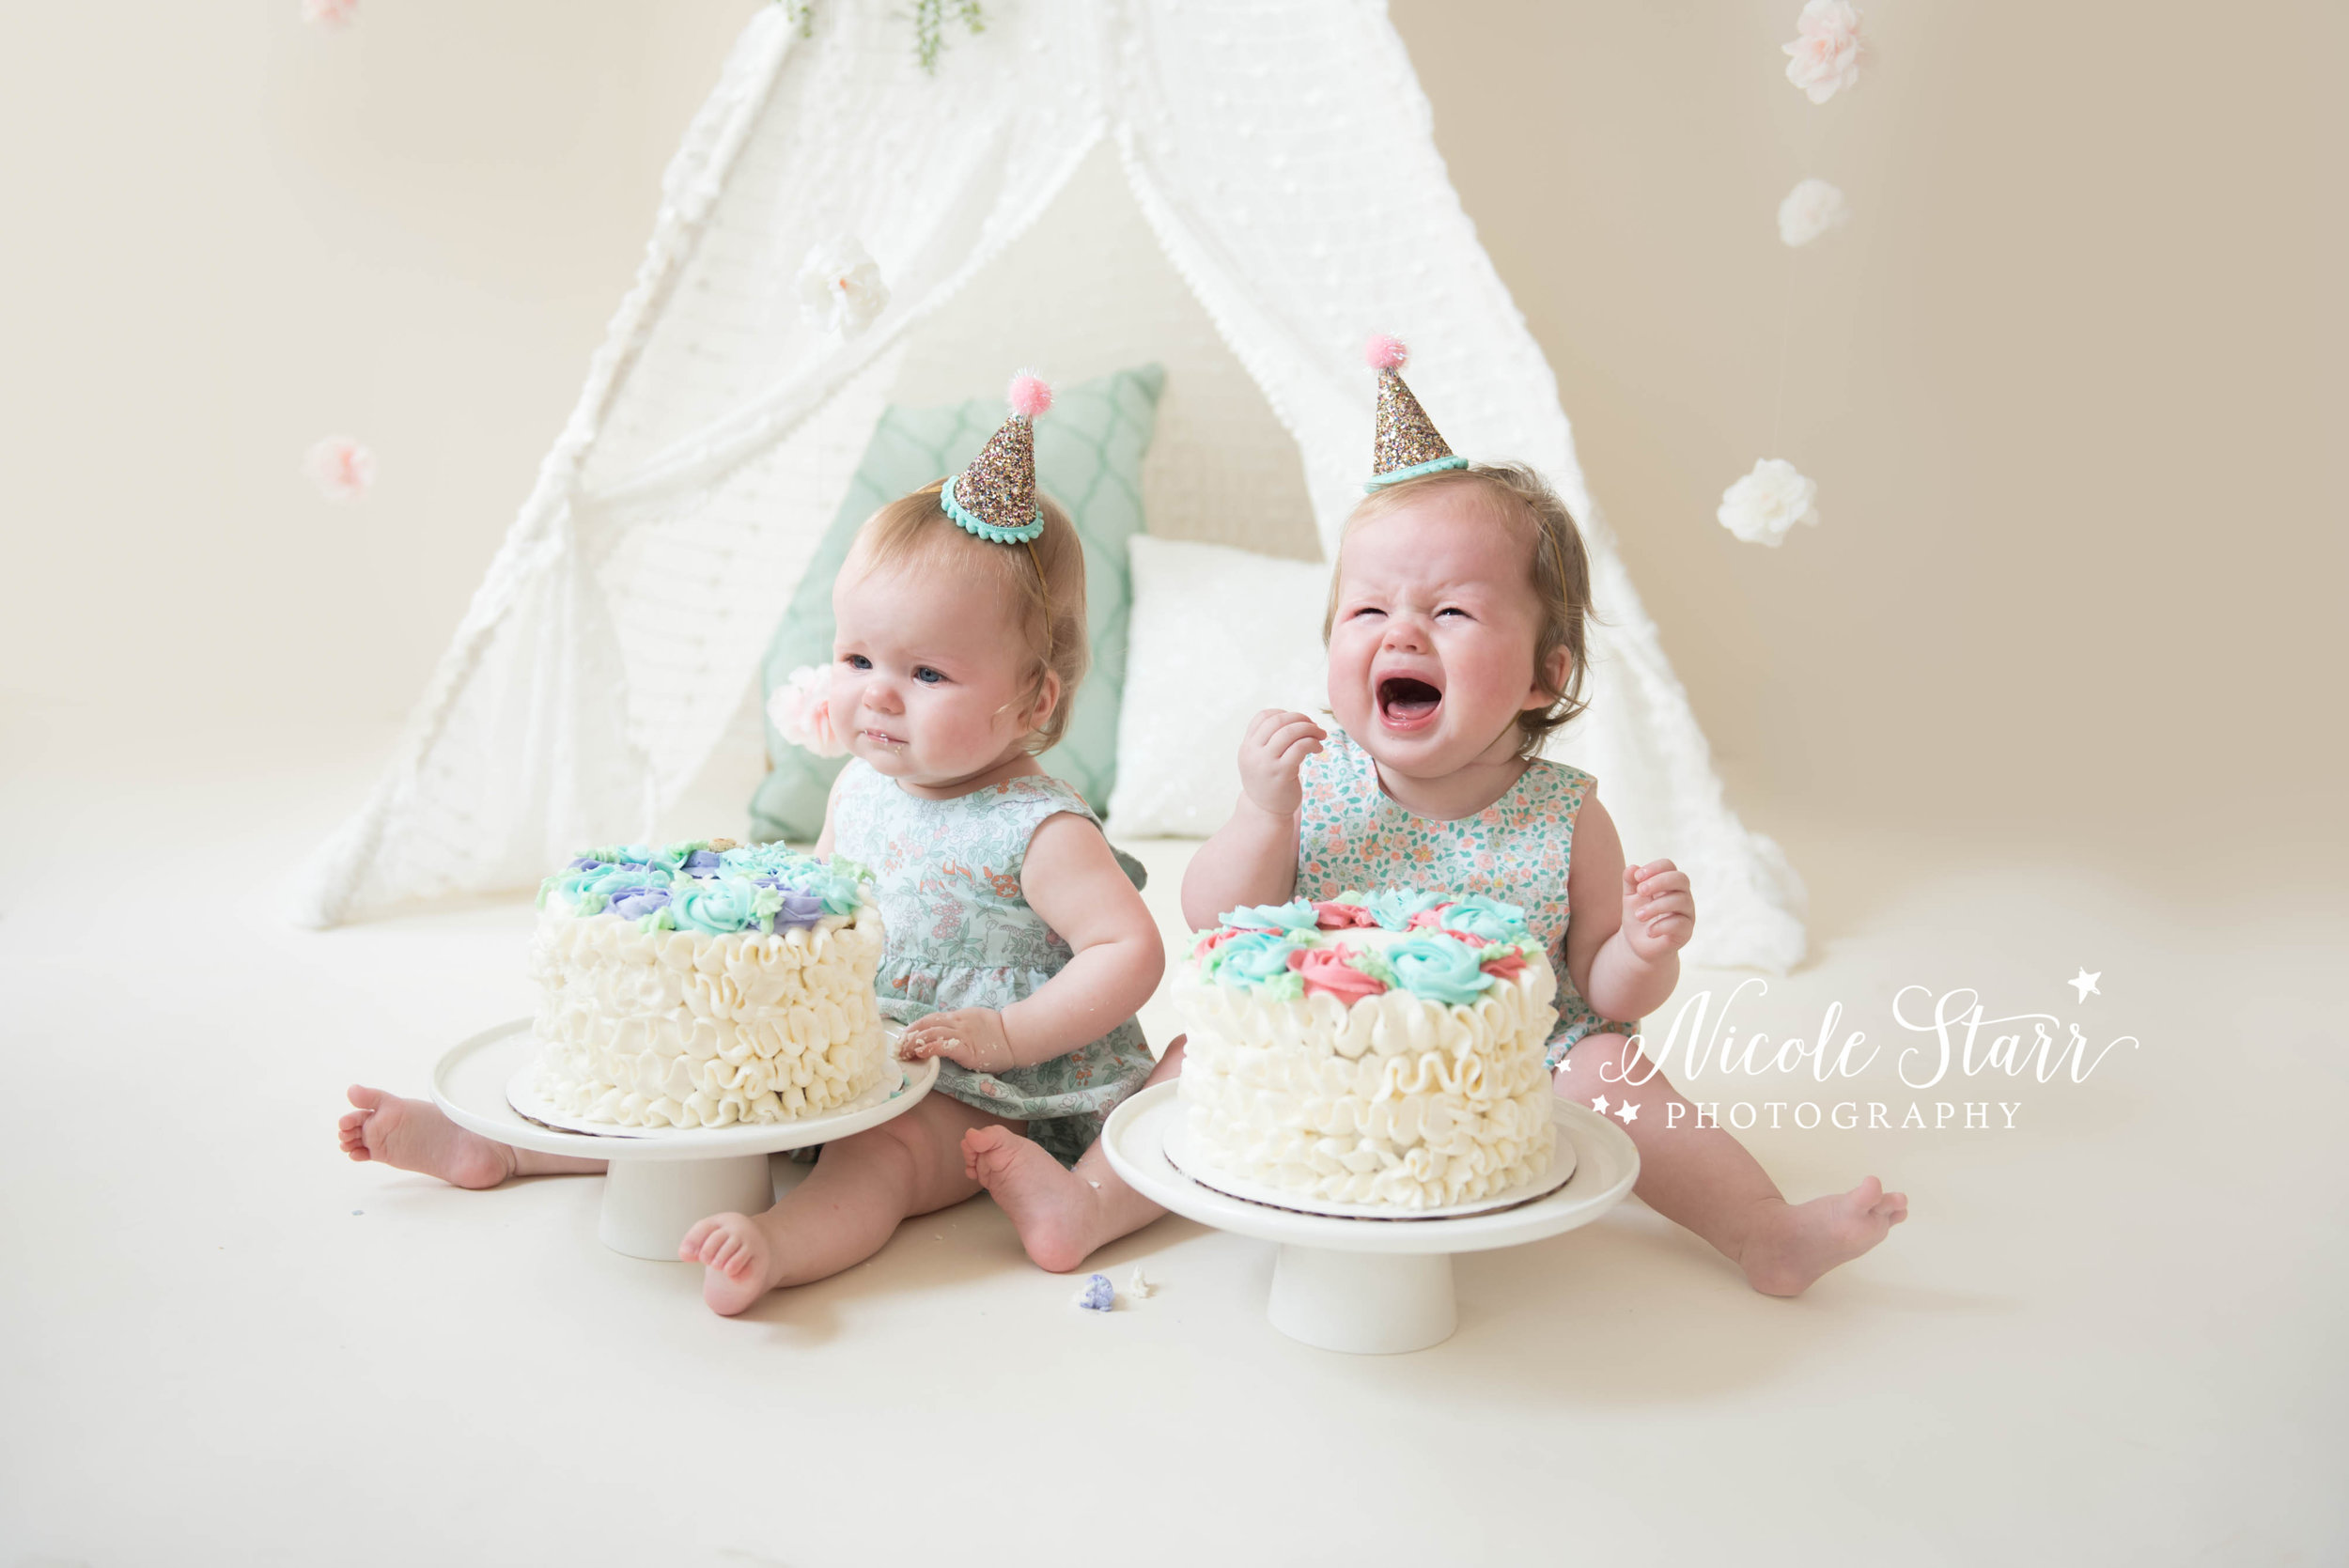 Boston and Saratoga Springs crying baby twins cake smash photo session